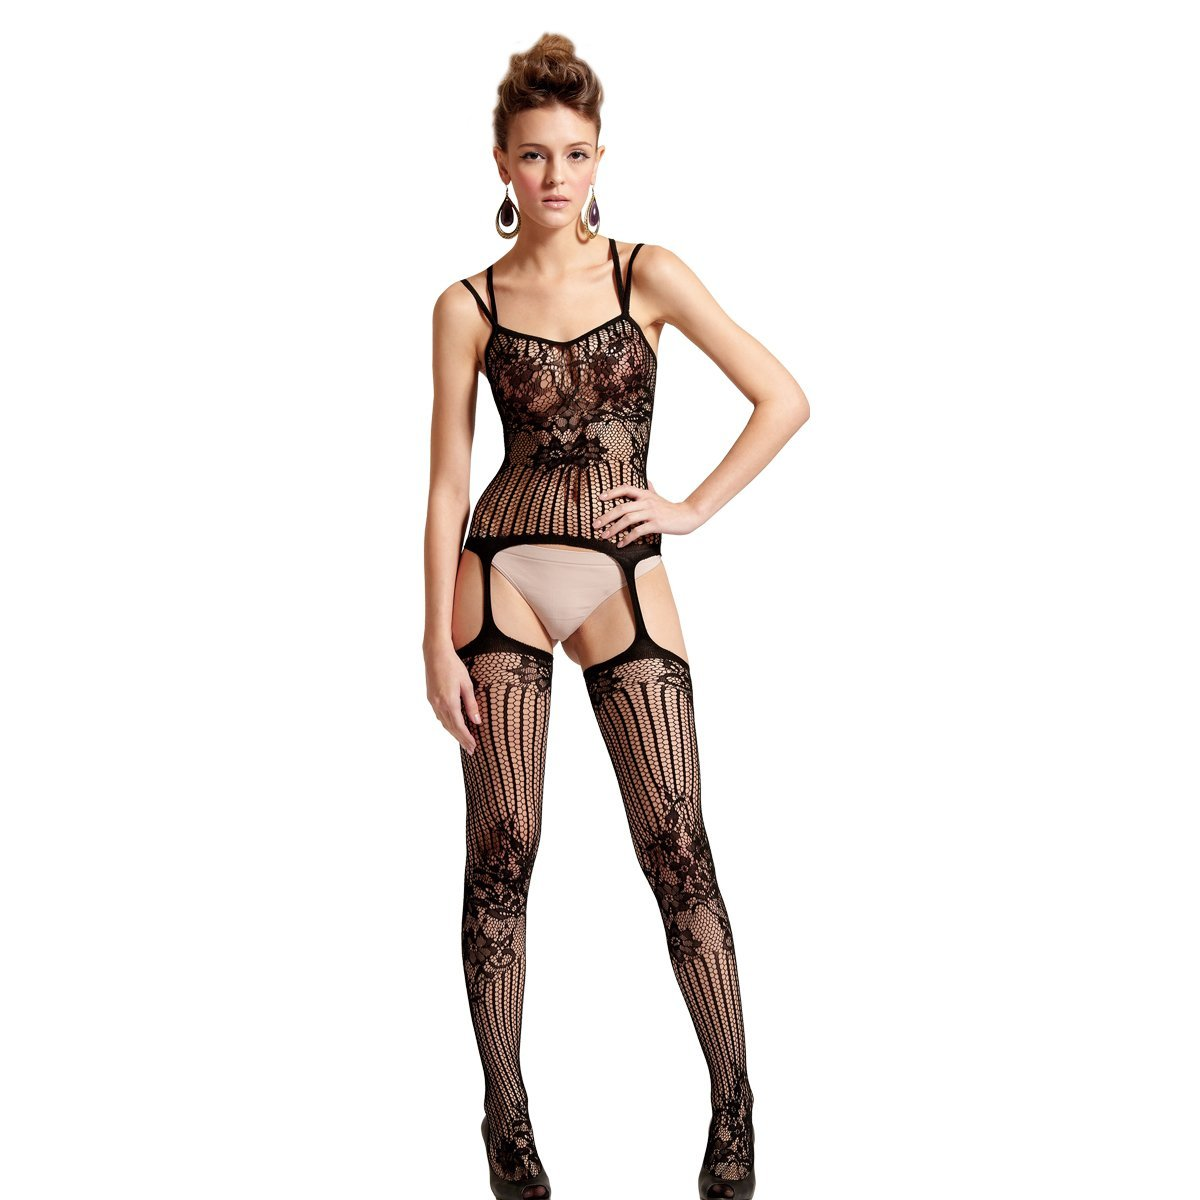 d2a963b515e Amazon.com  SpotLight Hosiery Elite Quality Women s OnePiece Floral Hexagon  Net Garter Bodystocking  Clothing